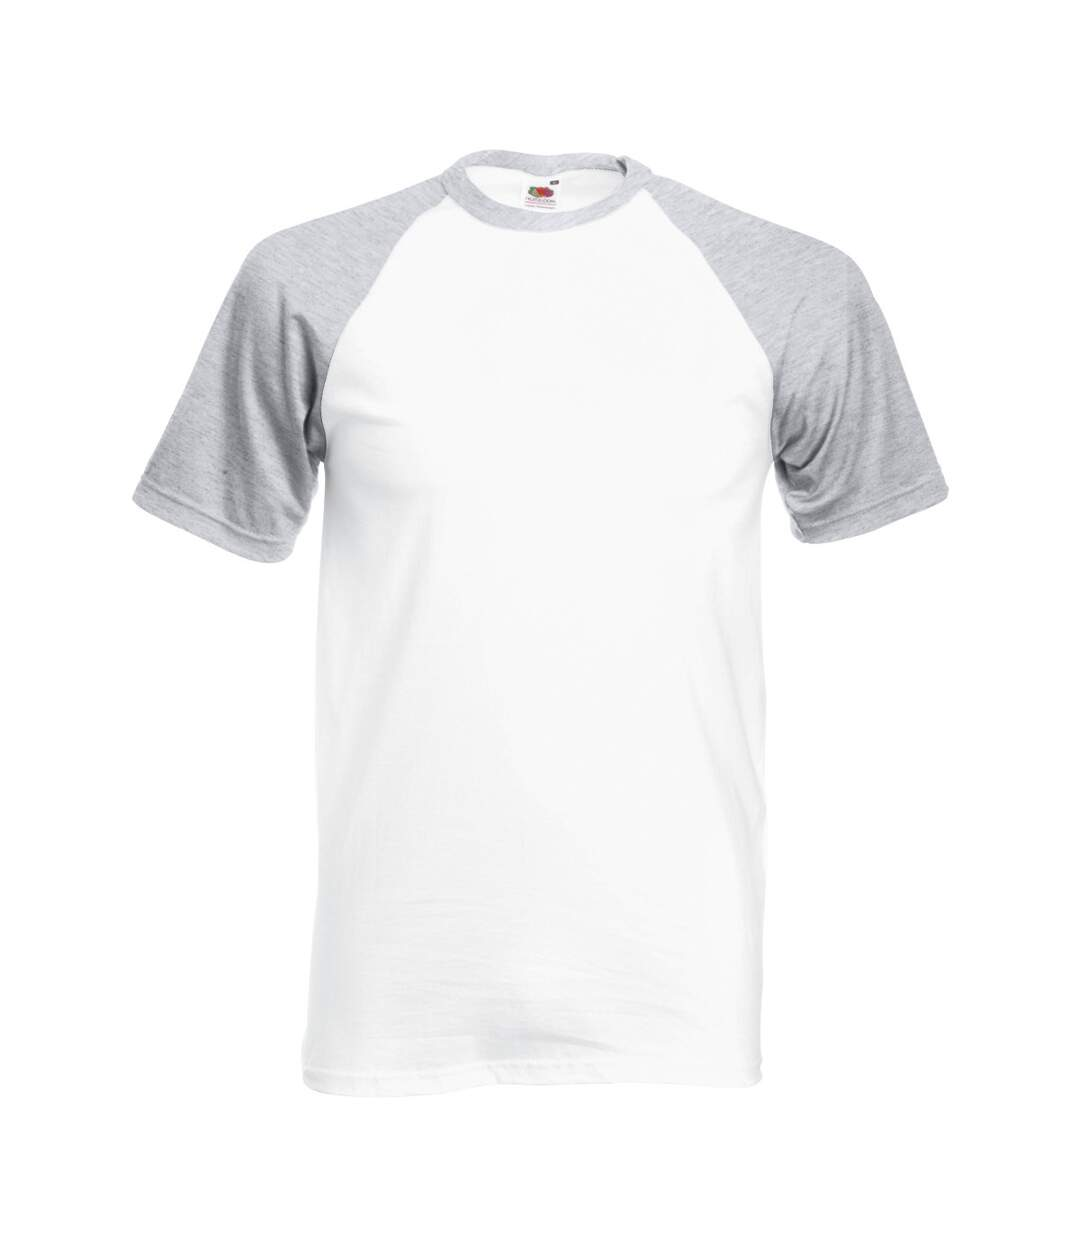 Fruit Of The Loom Mens Short Sleeve Baseball T-Shirt (White/Heather Grey) - UTBC327